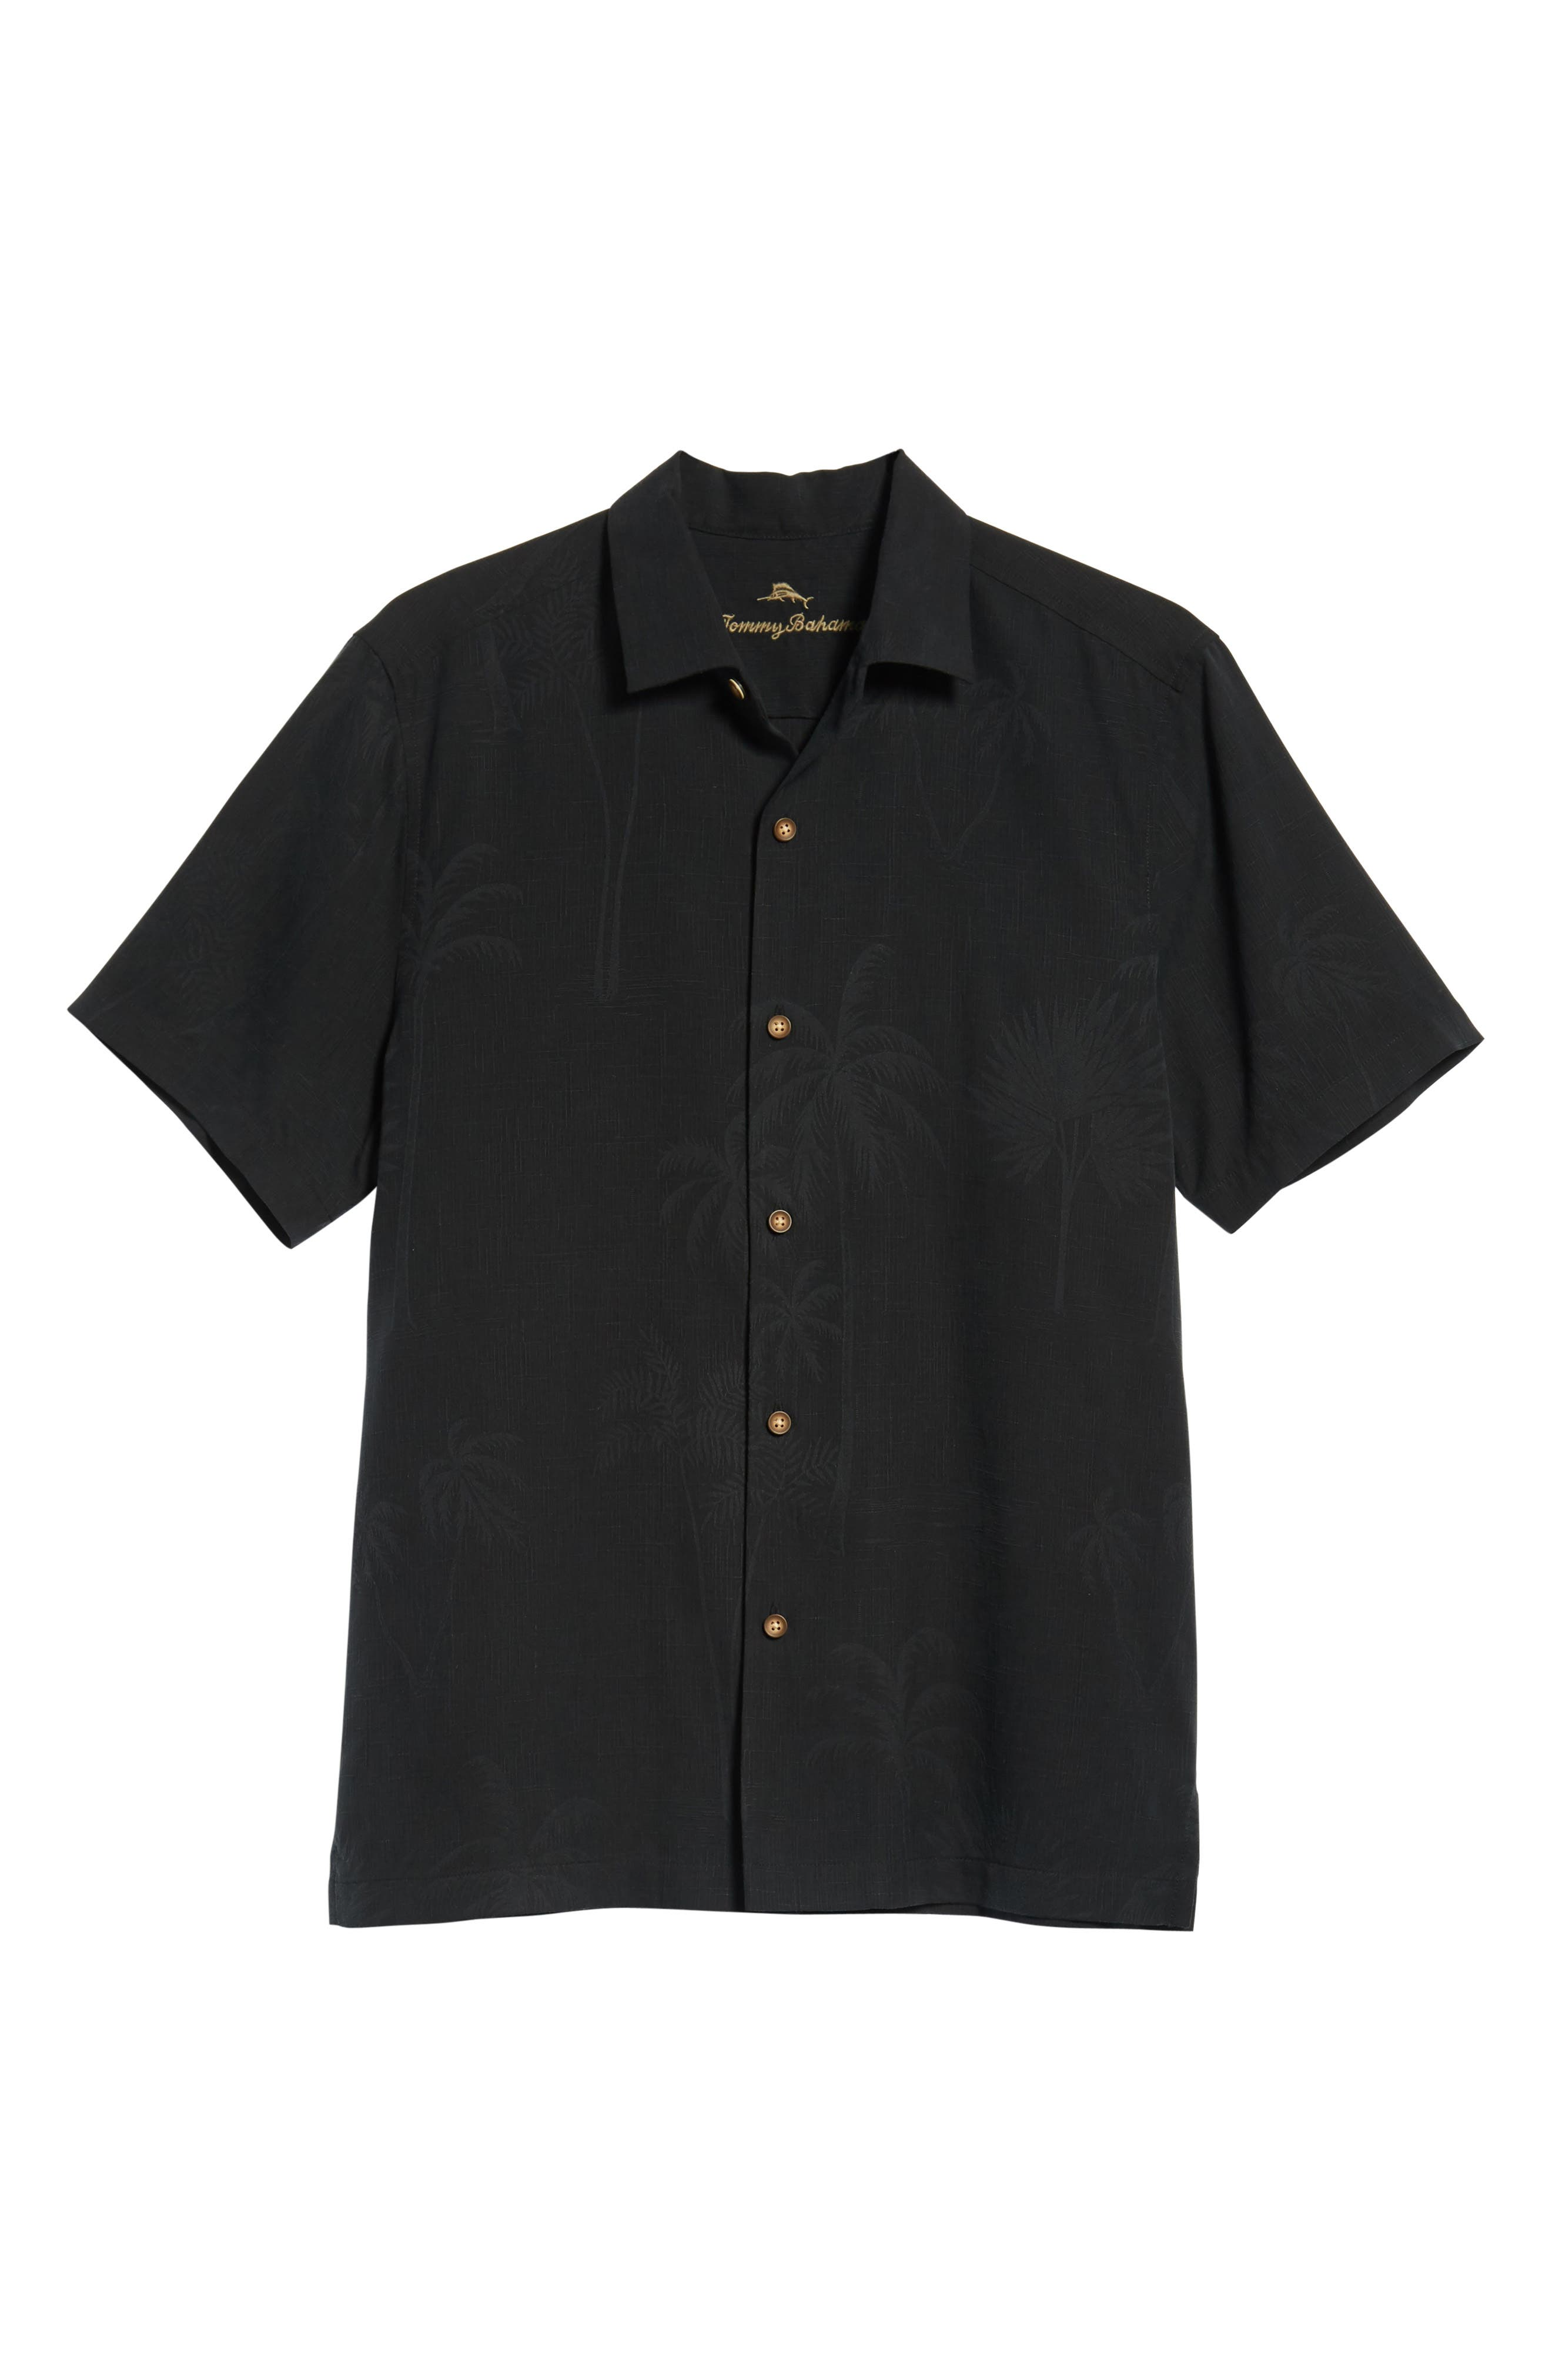 Wish Yule Were Here Silk Camp Shirt,                             Alternate thumbnail 6, color,                             BLACK